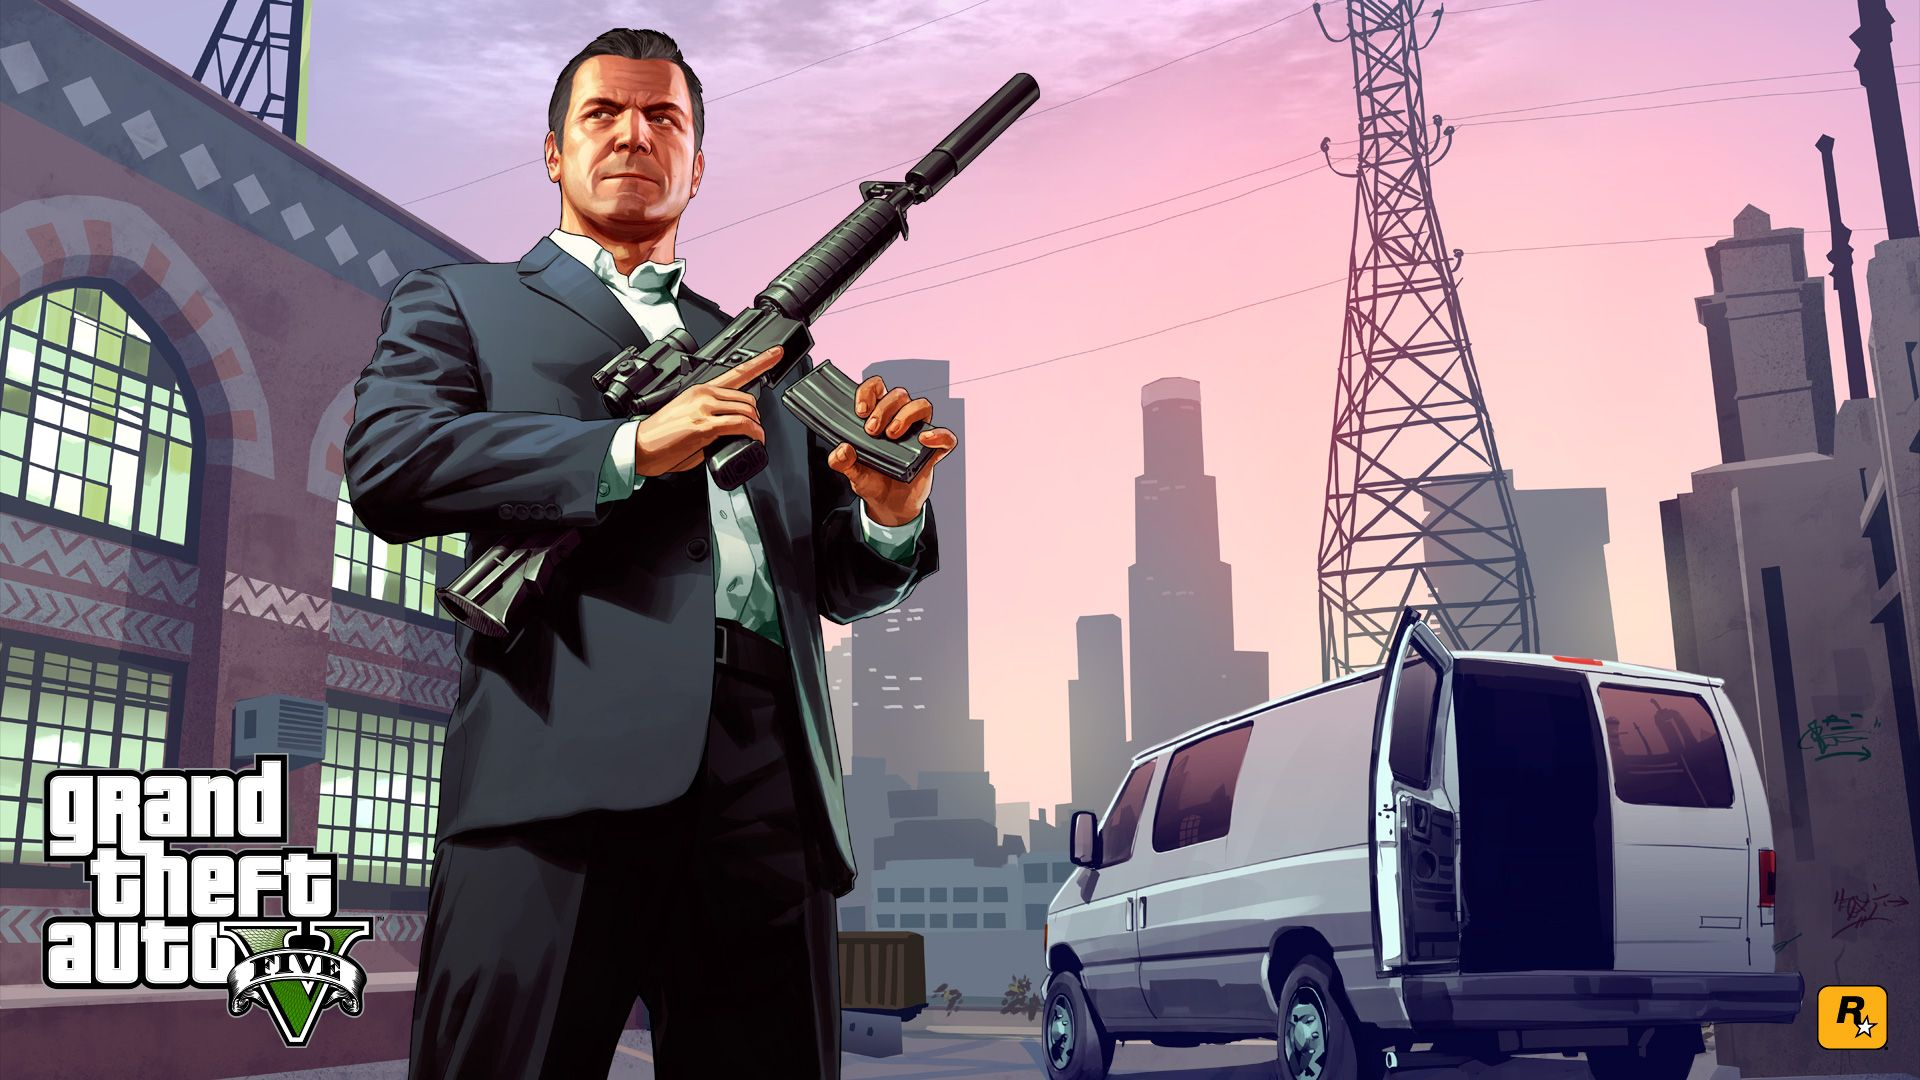 Gta V 10 Grand Theft Auto Grand Theft Auto Artwork Gta